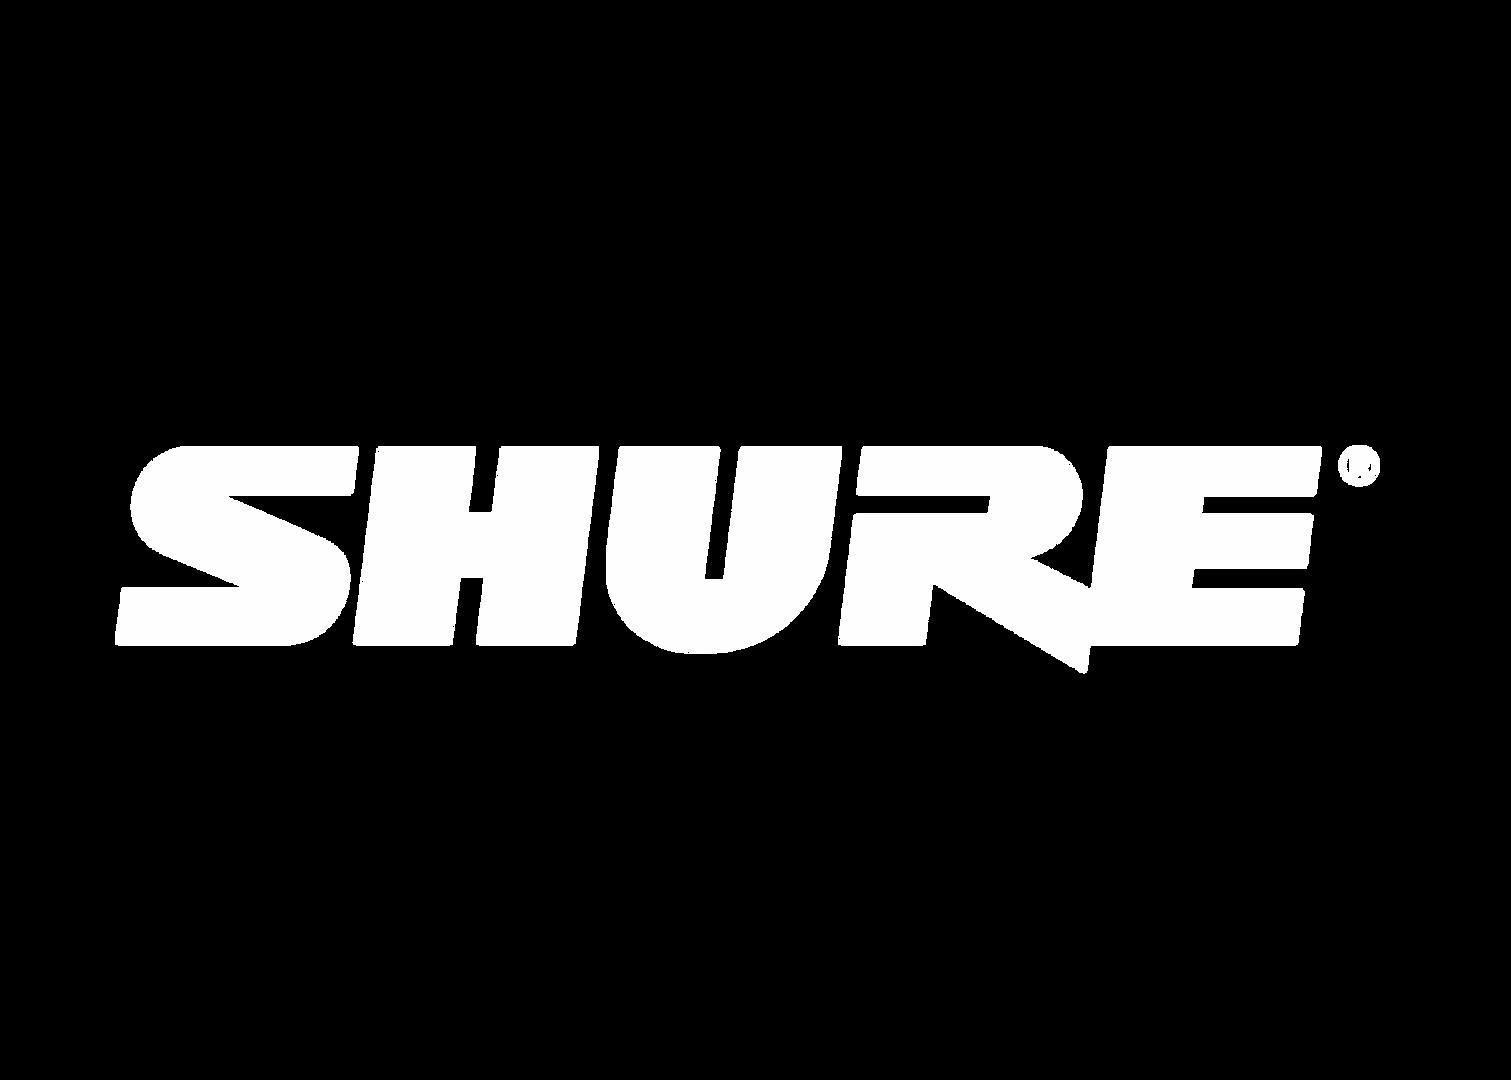 SHUR.png